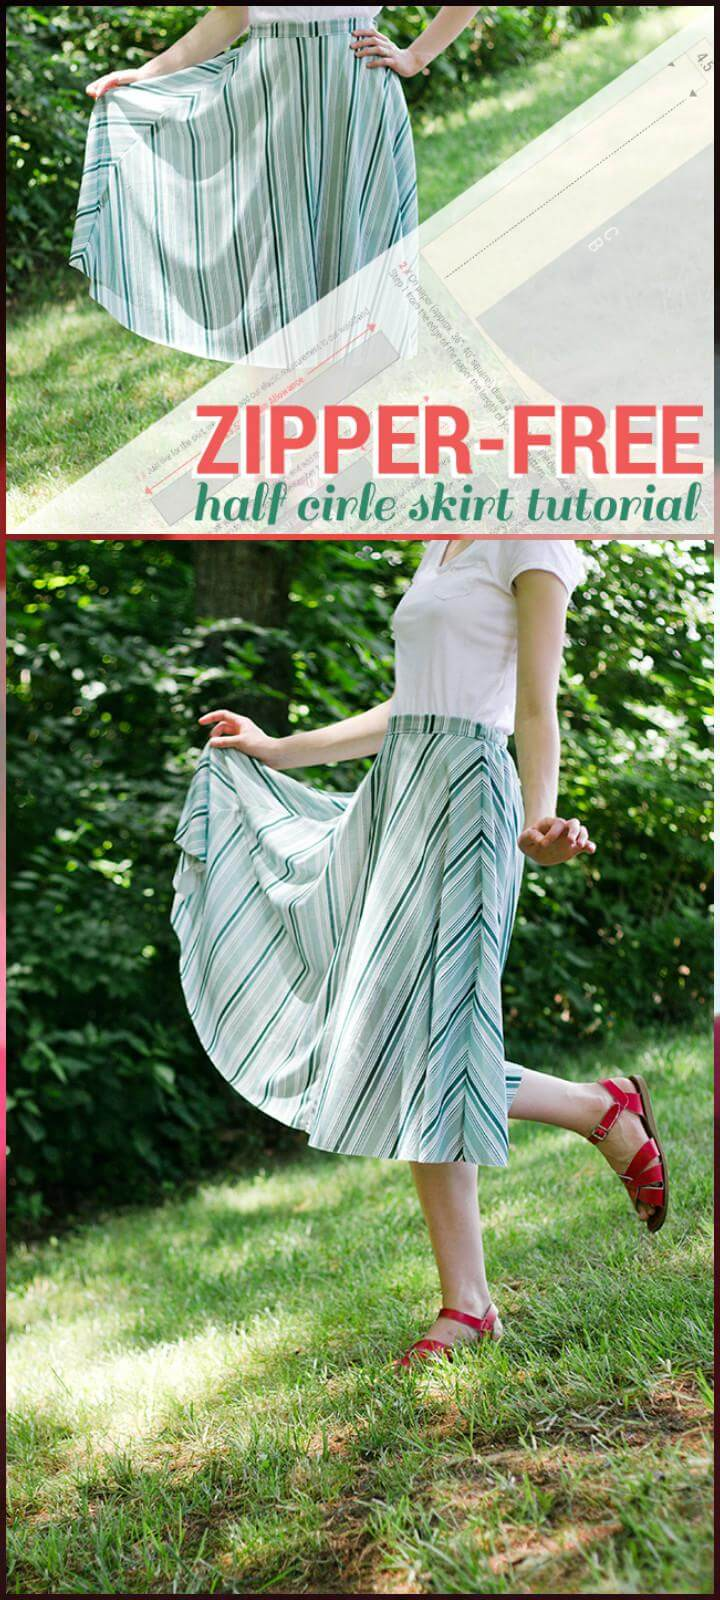 easy zipper-free half circle skirt tutorial